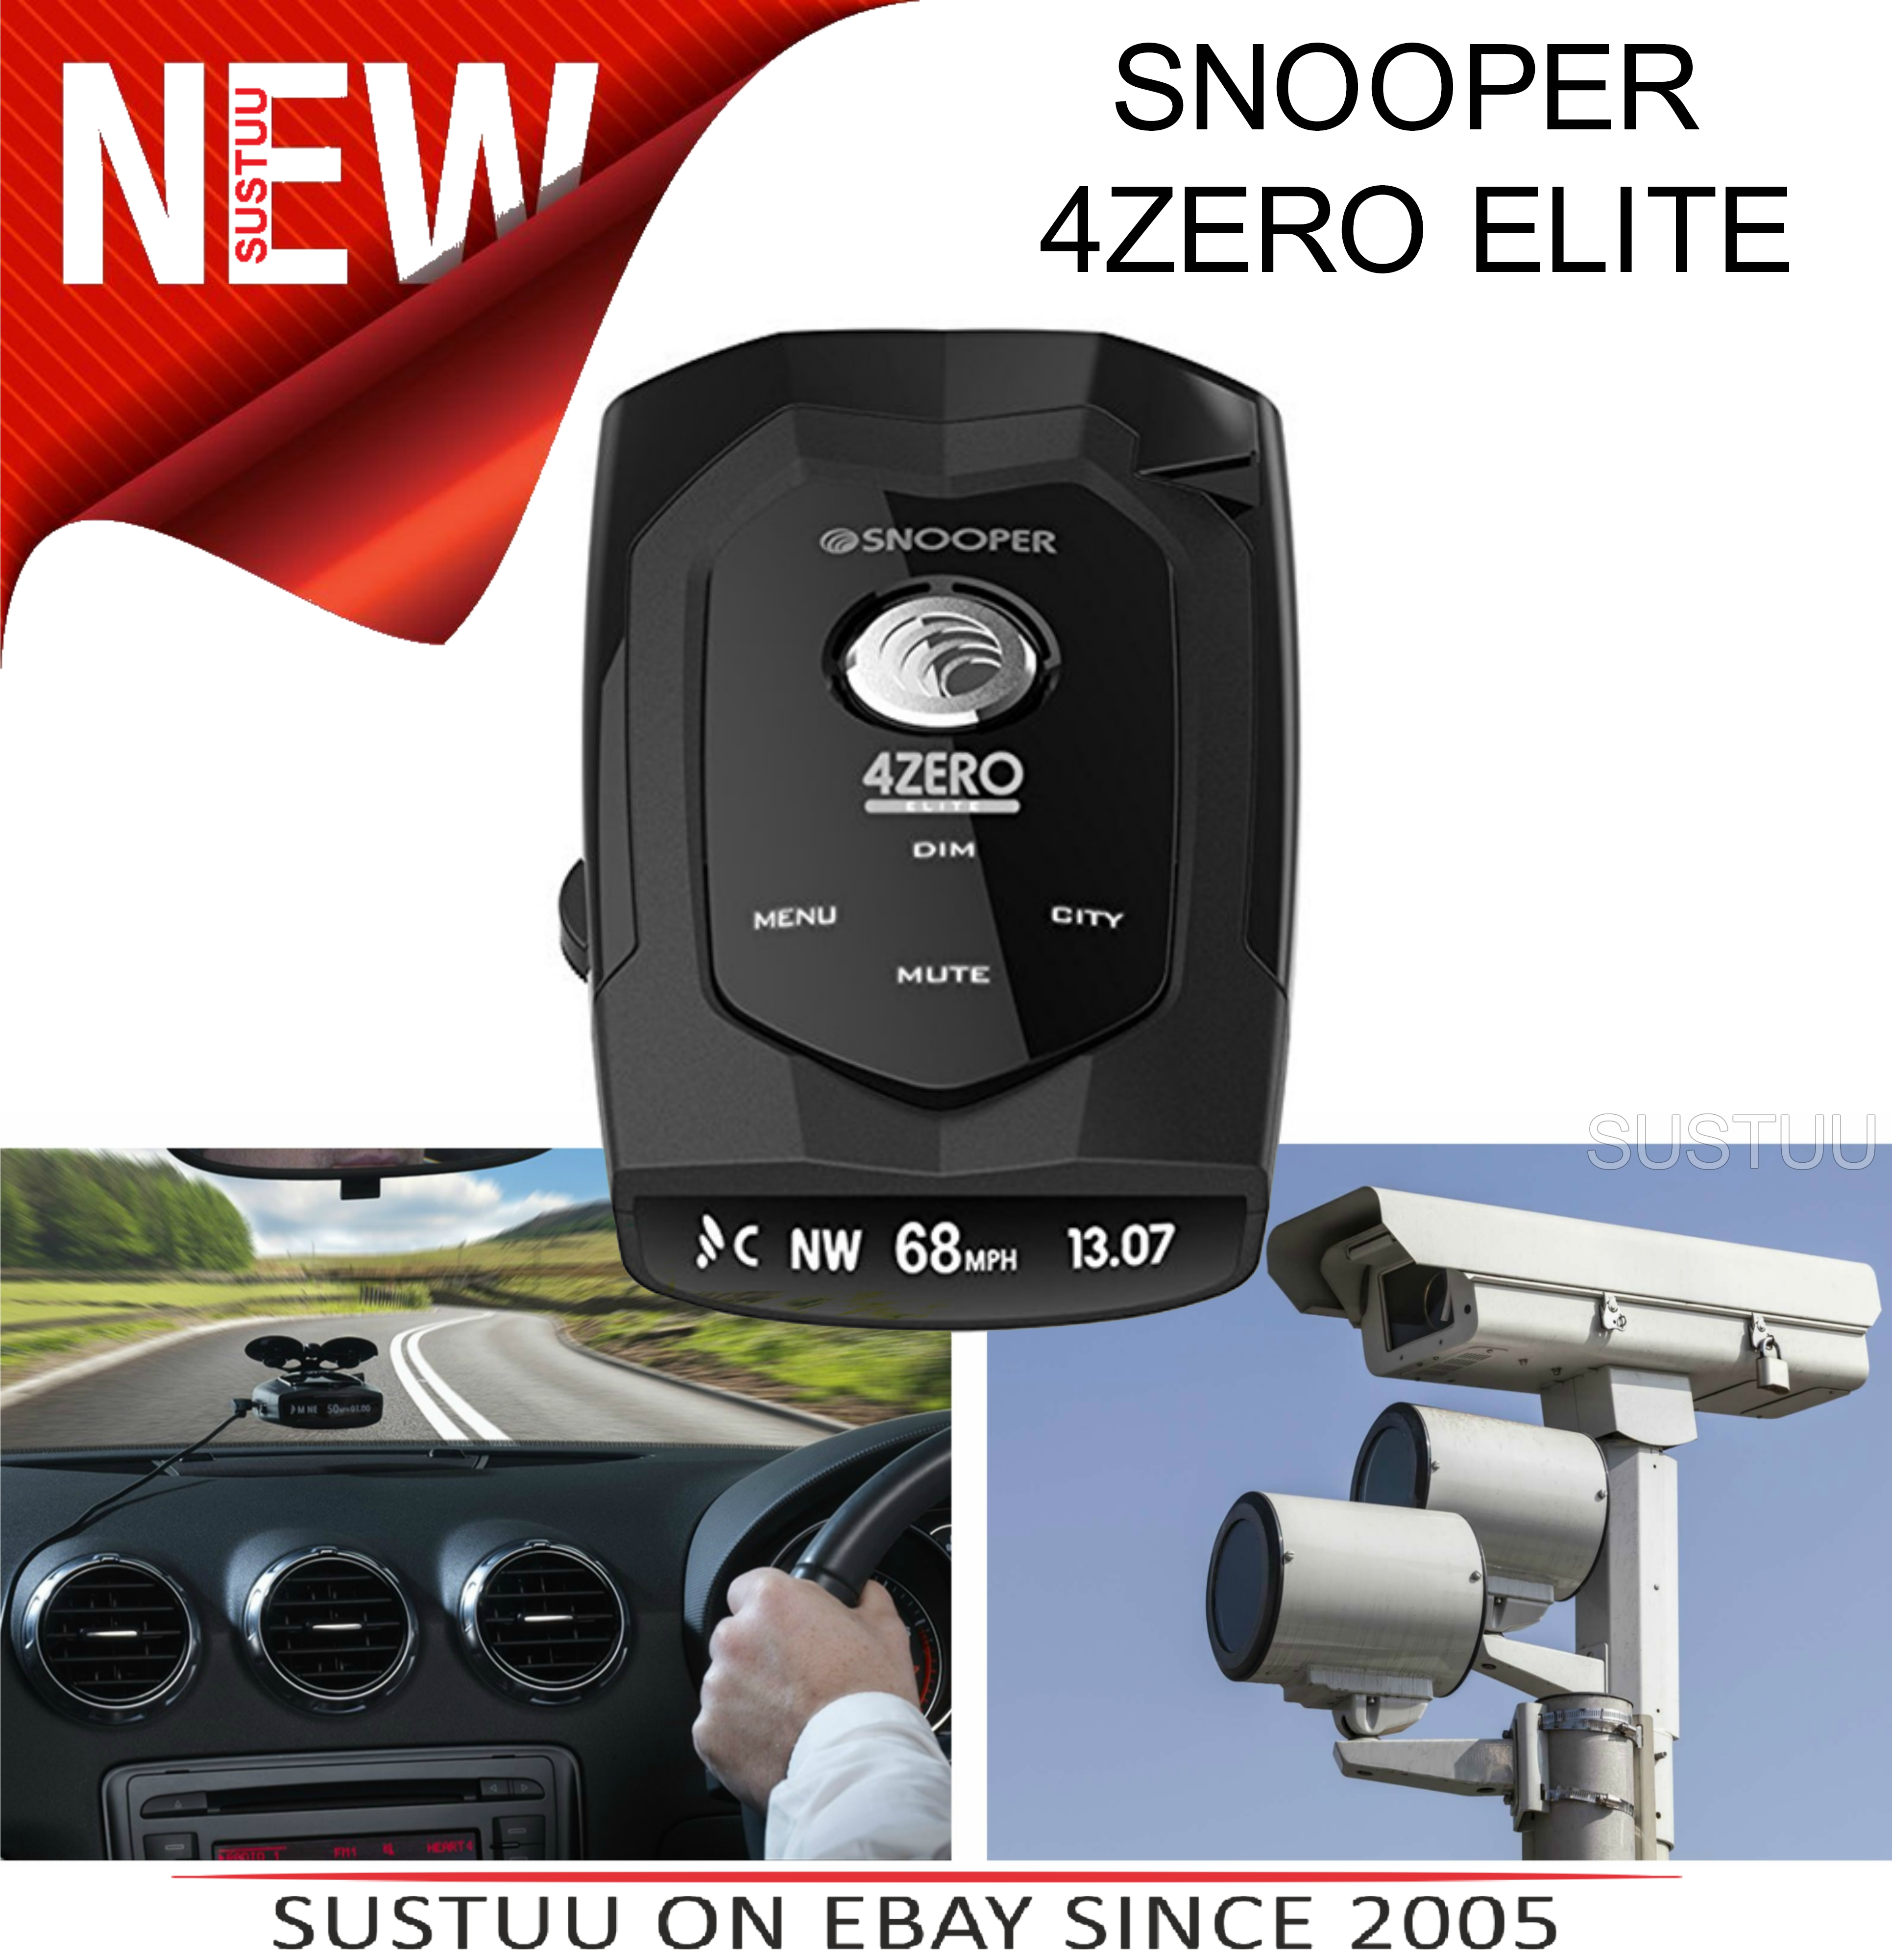 Snooper 4ZERO Elite Speed Camera Detector GPS /RADAR/LASER Voice & Display Alert